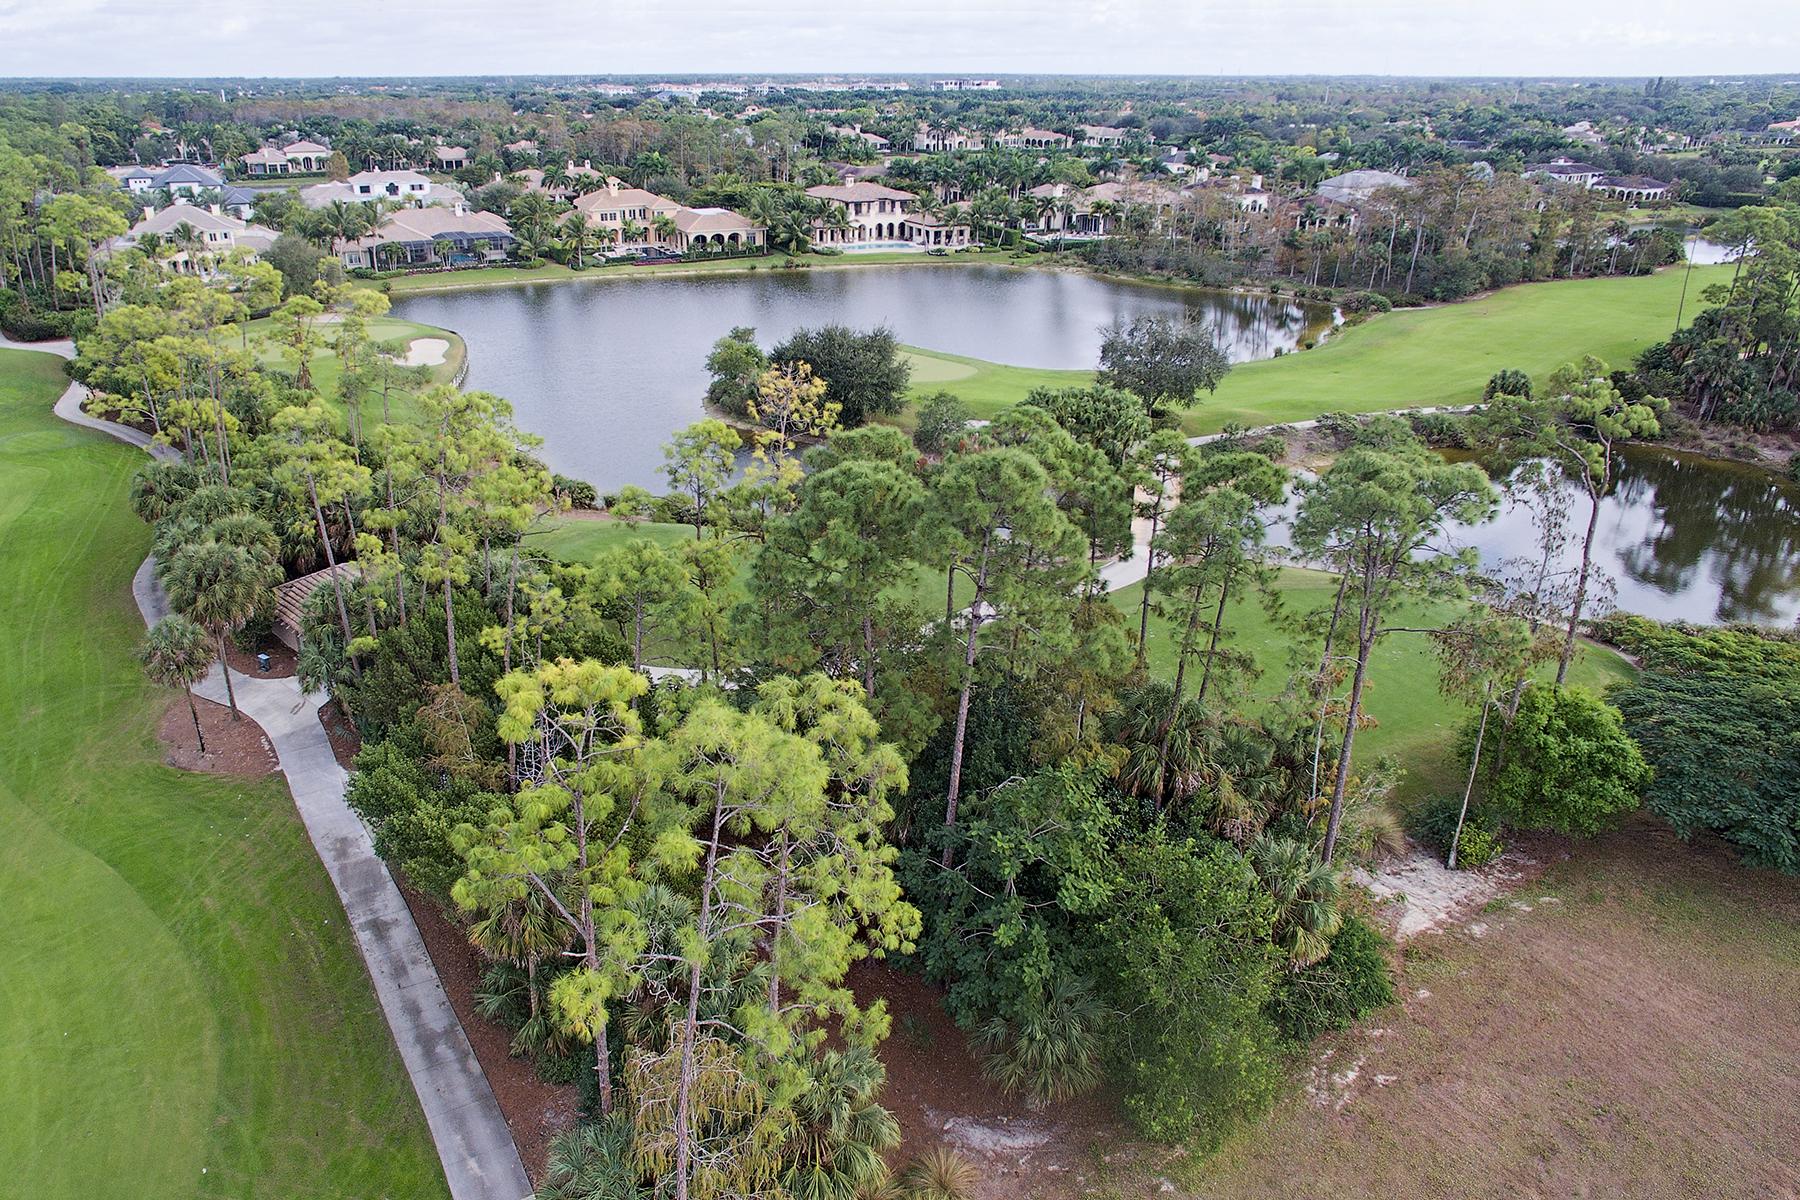 Terreno para Venda às 1260 Gordon River Trl , Naples, FL 34105 1260 Gordon River Trl Naples, Florida, 34105 Estados Unidos